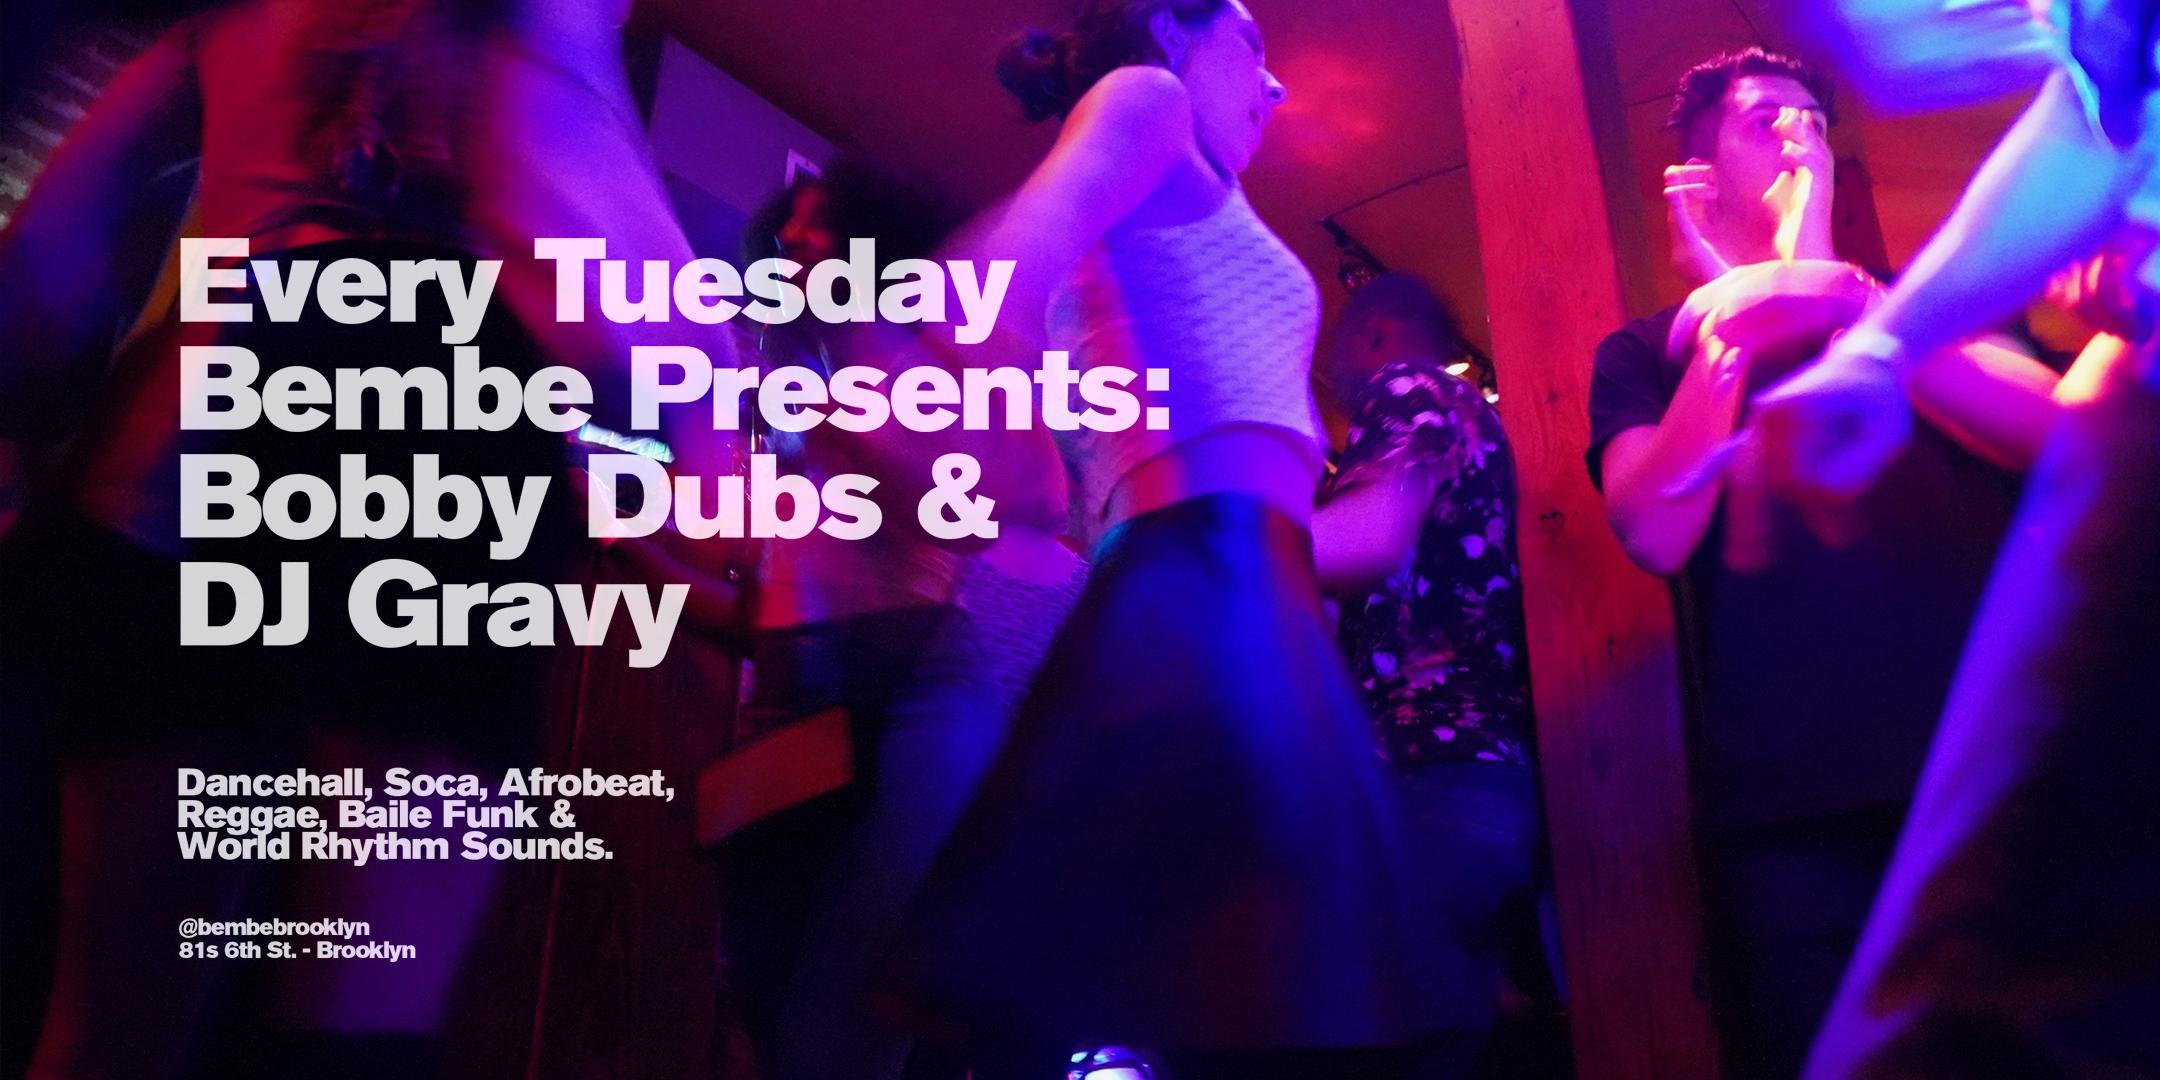 Tuesday Bembe Presents: DJ Gravy and DJ Bobby Dubs